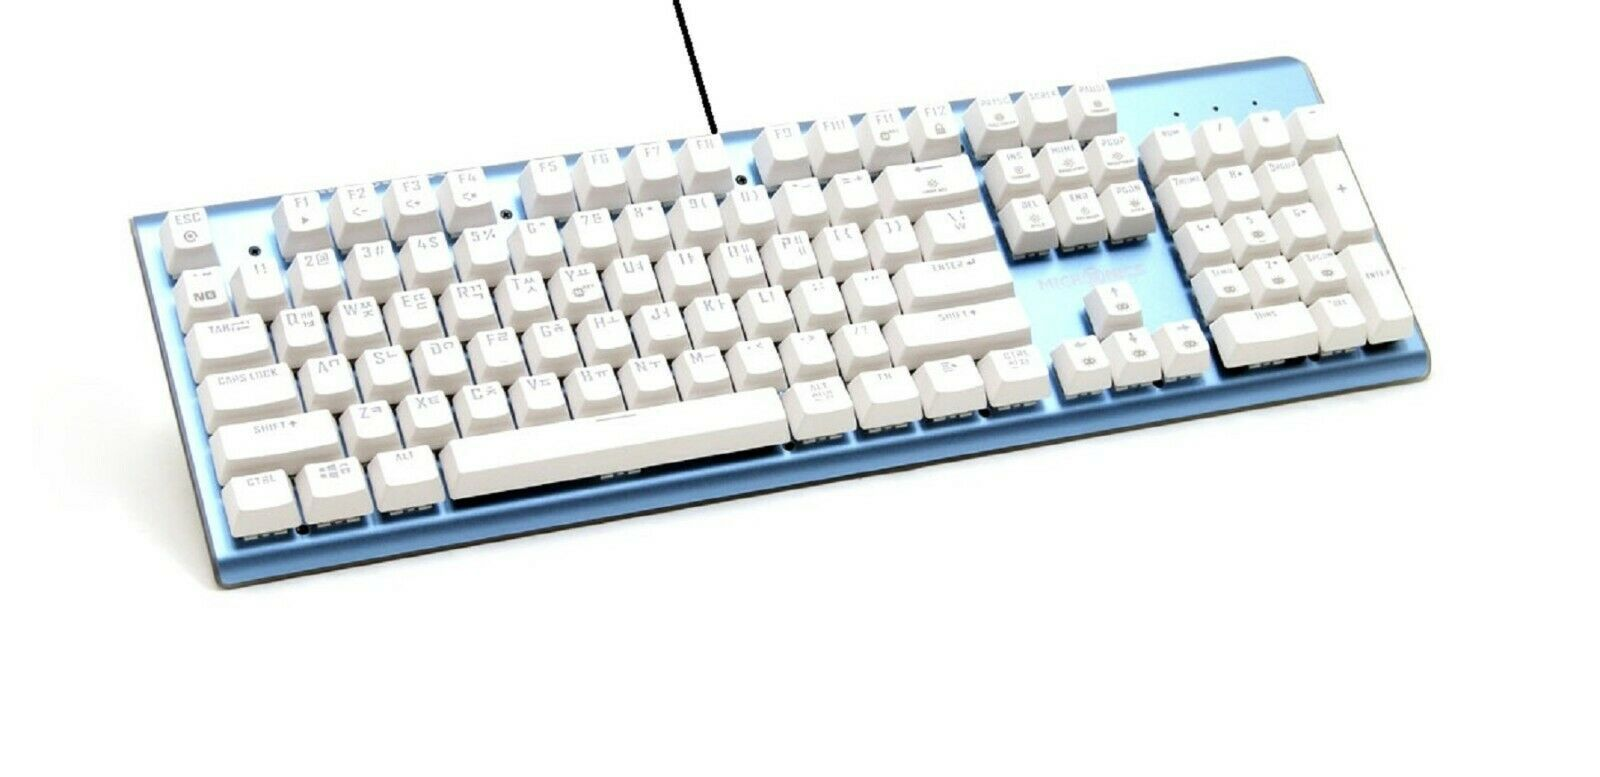 Micronics K735 Mechanical Gaming Keyboard Red Body (Kailh Box Switch White)